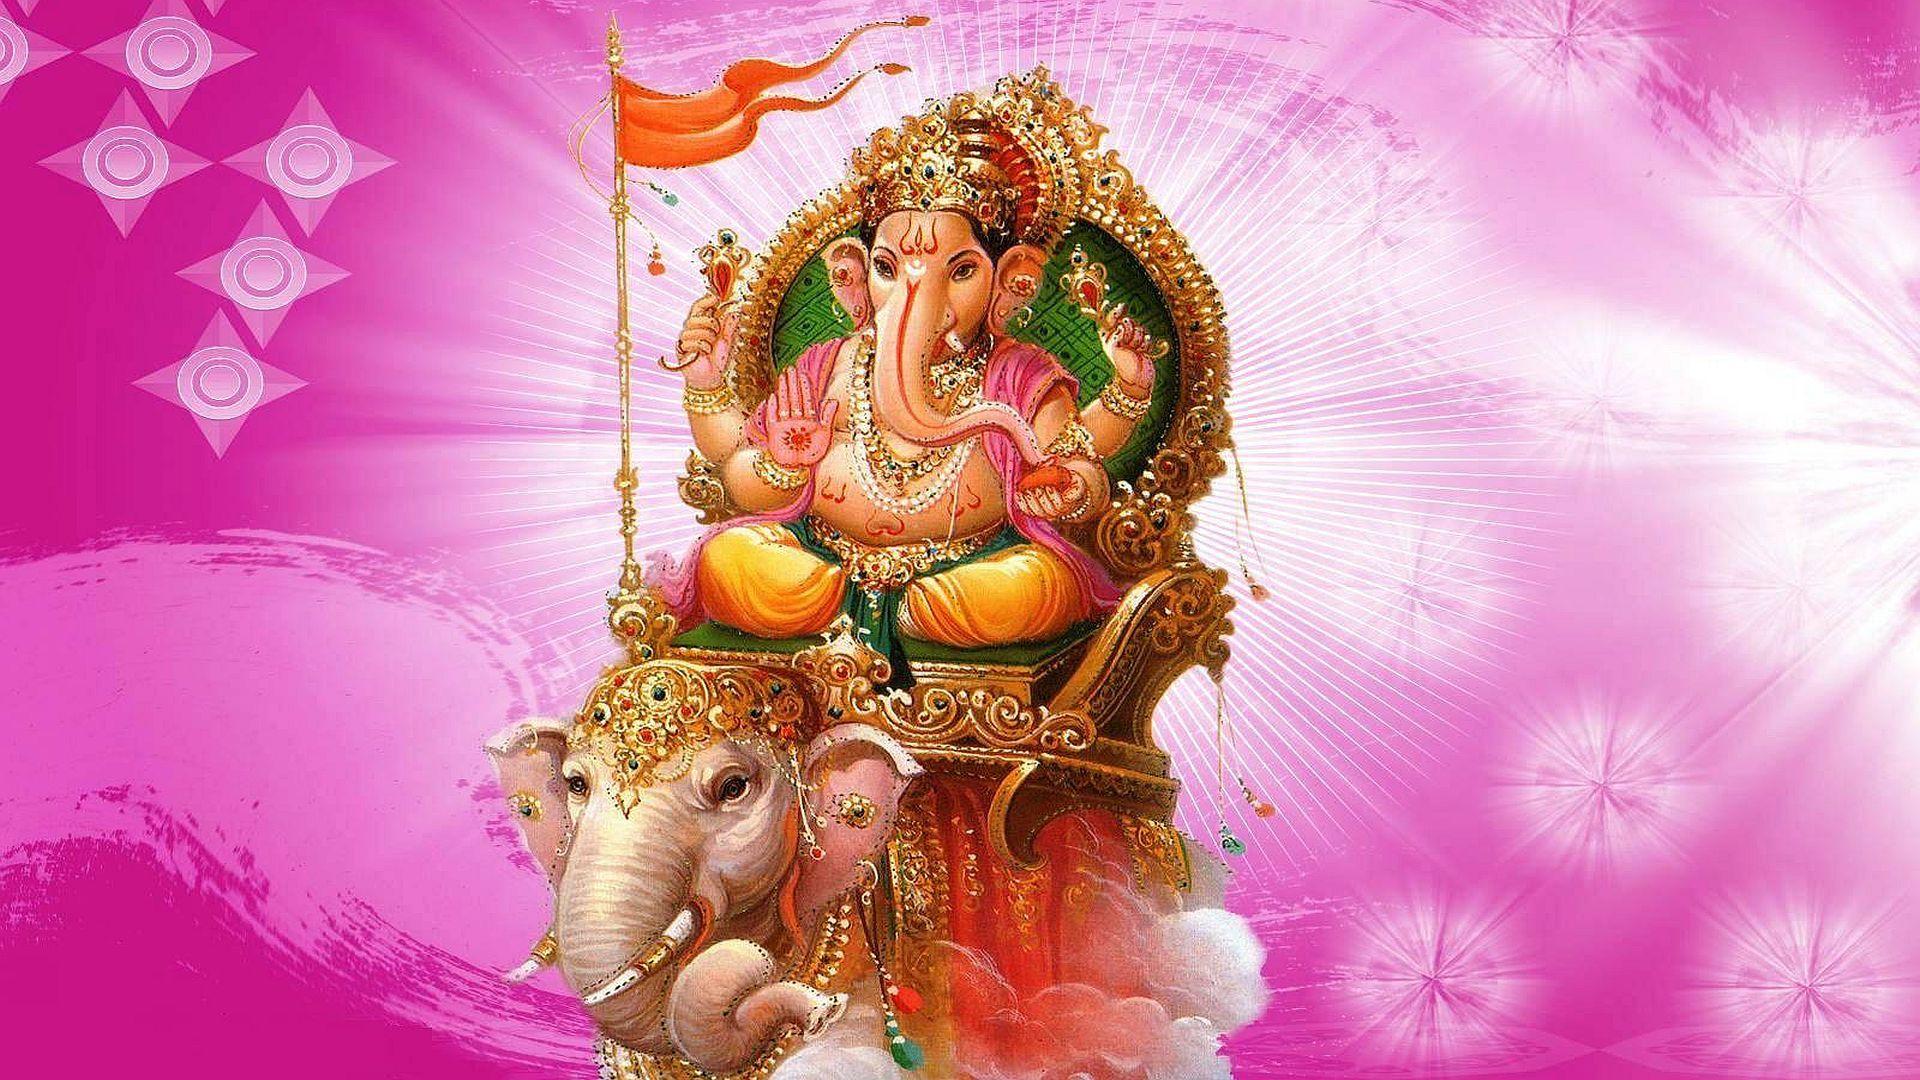 Hd Full Hd Ganesh Wallpaper ...